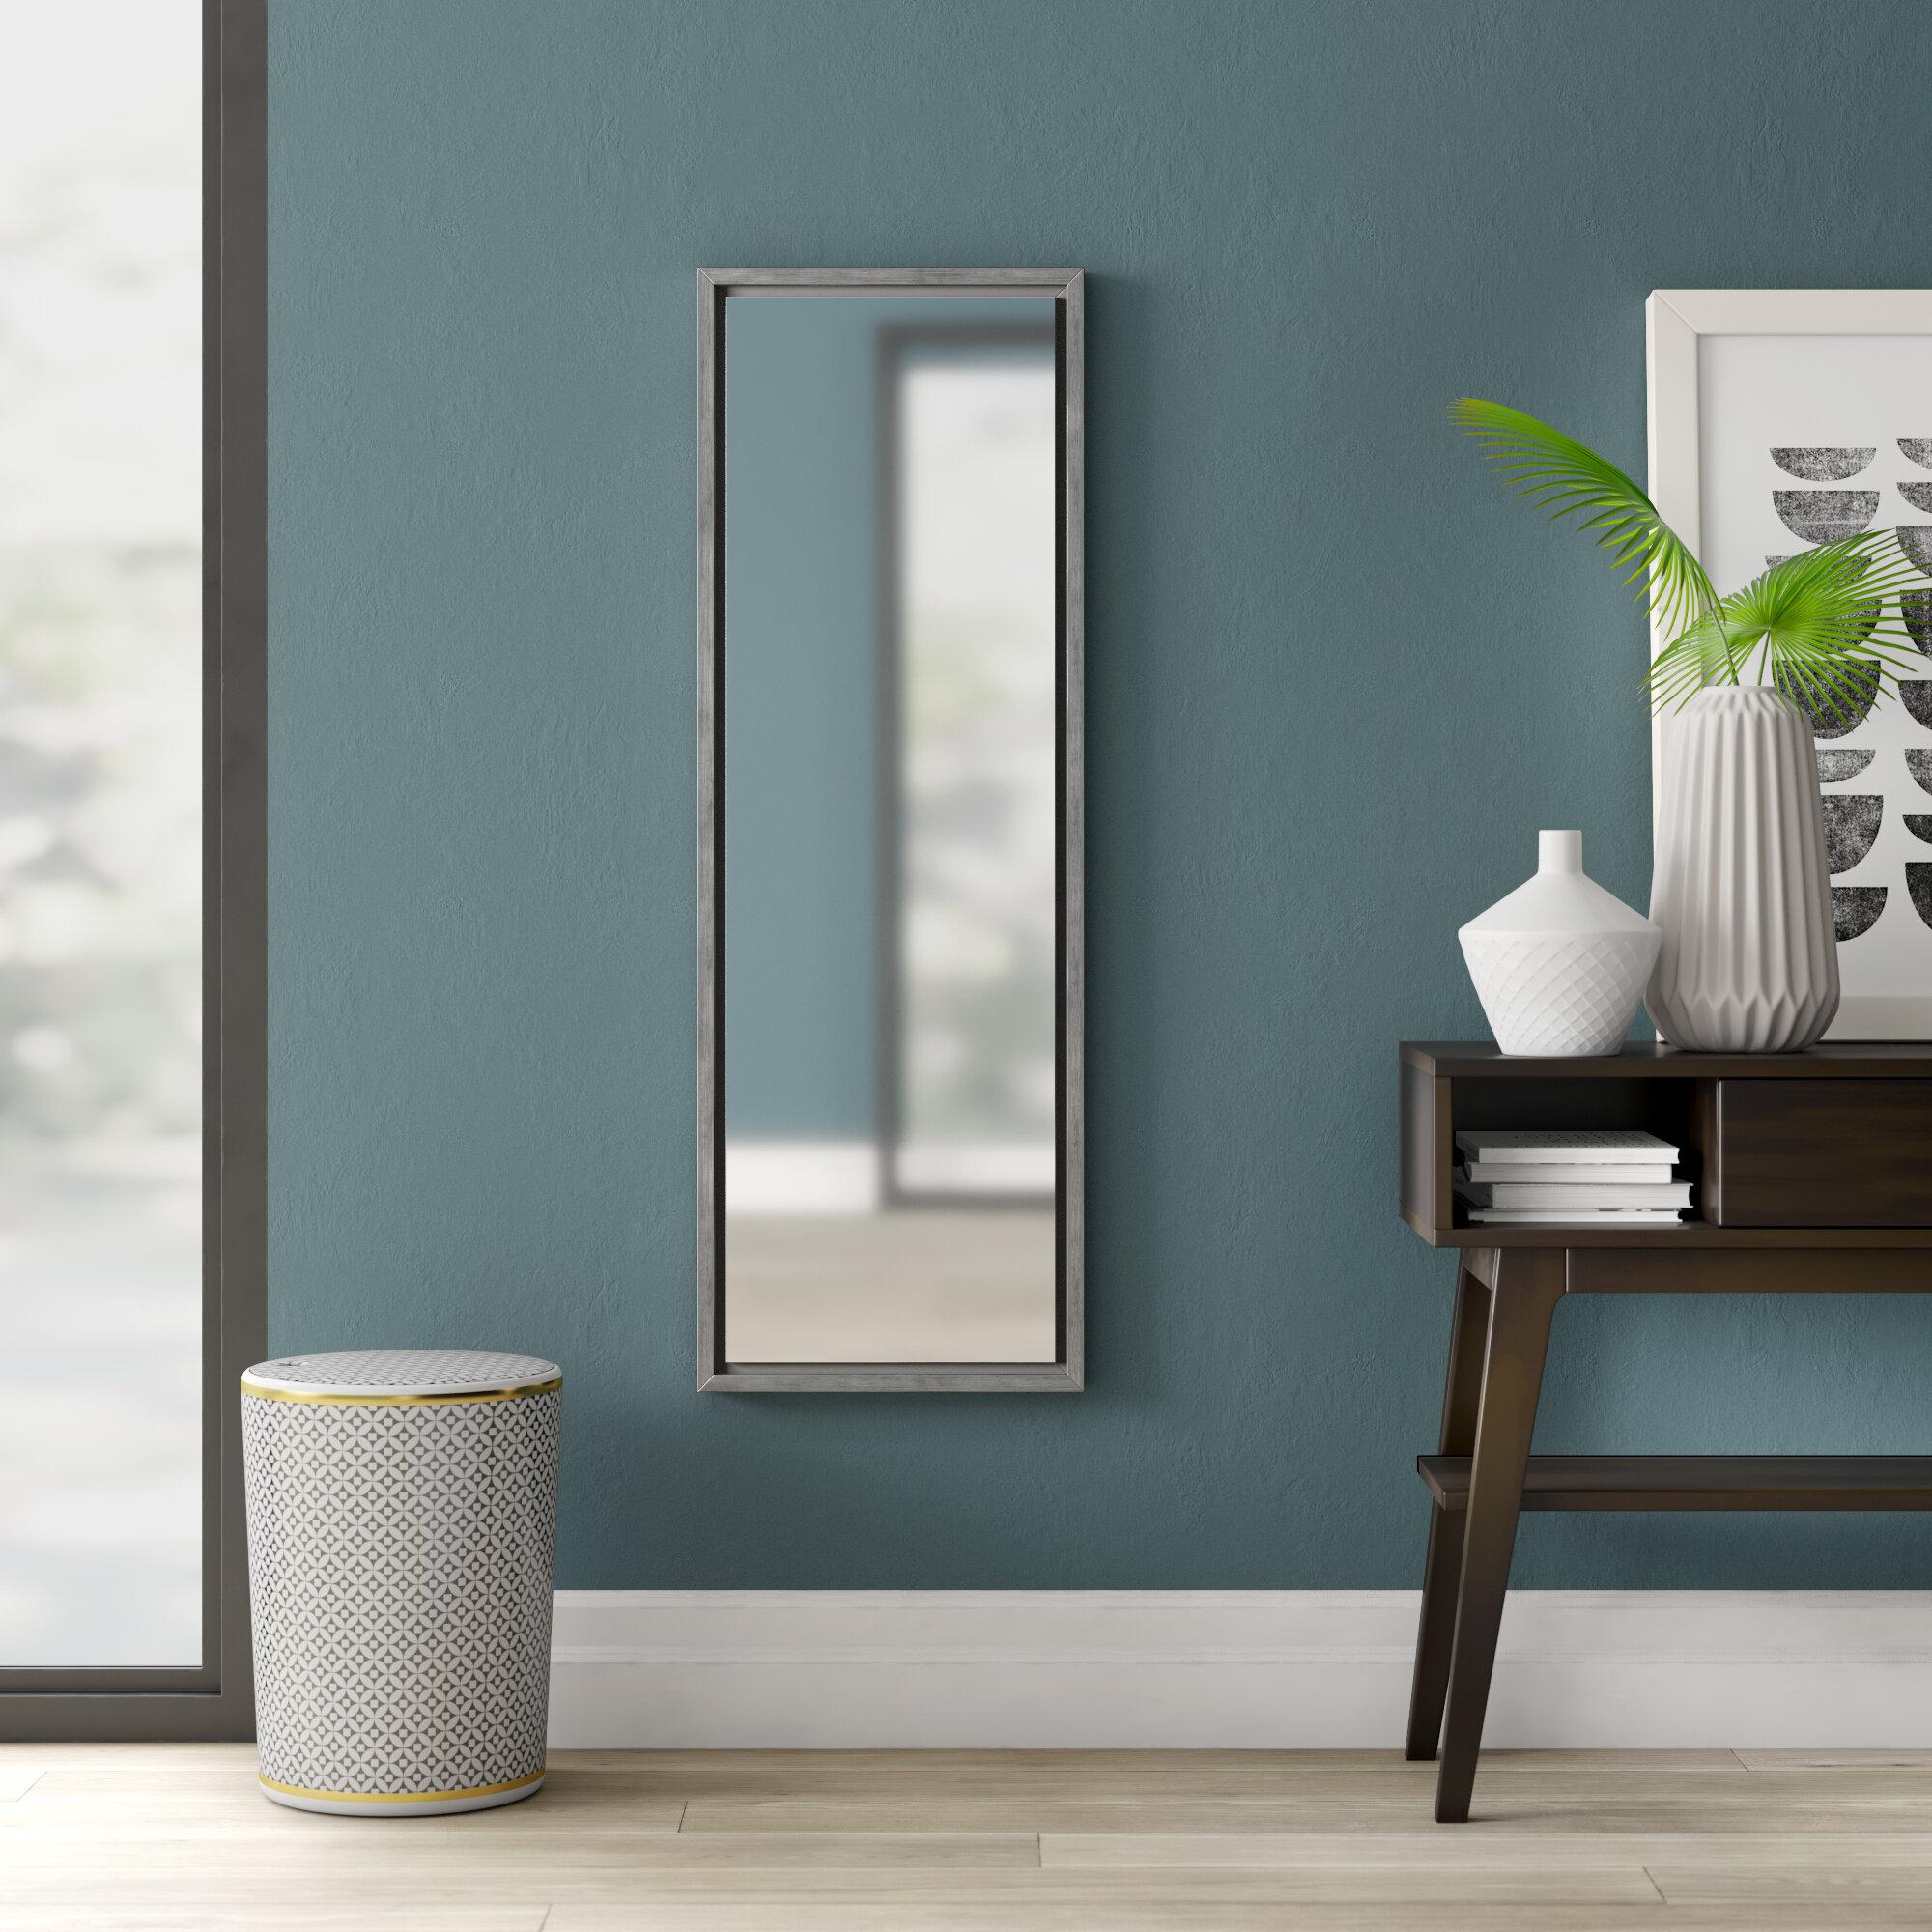 Glass Framed Mirror | Wayfair Inside Caja Rectangle Glass Frame Wall Mirrors (View 10 of 30)